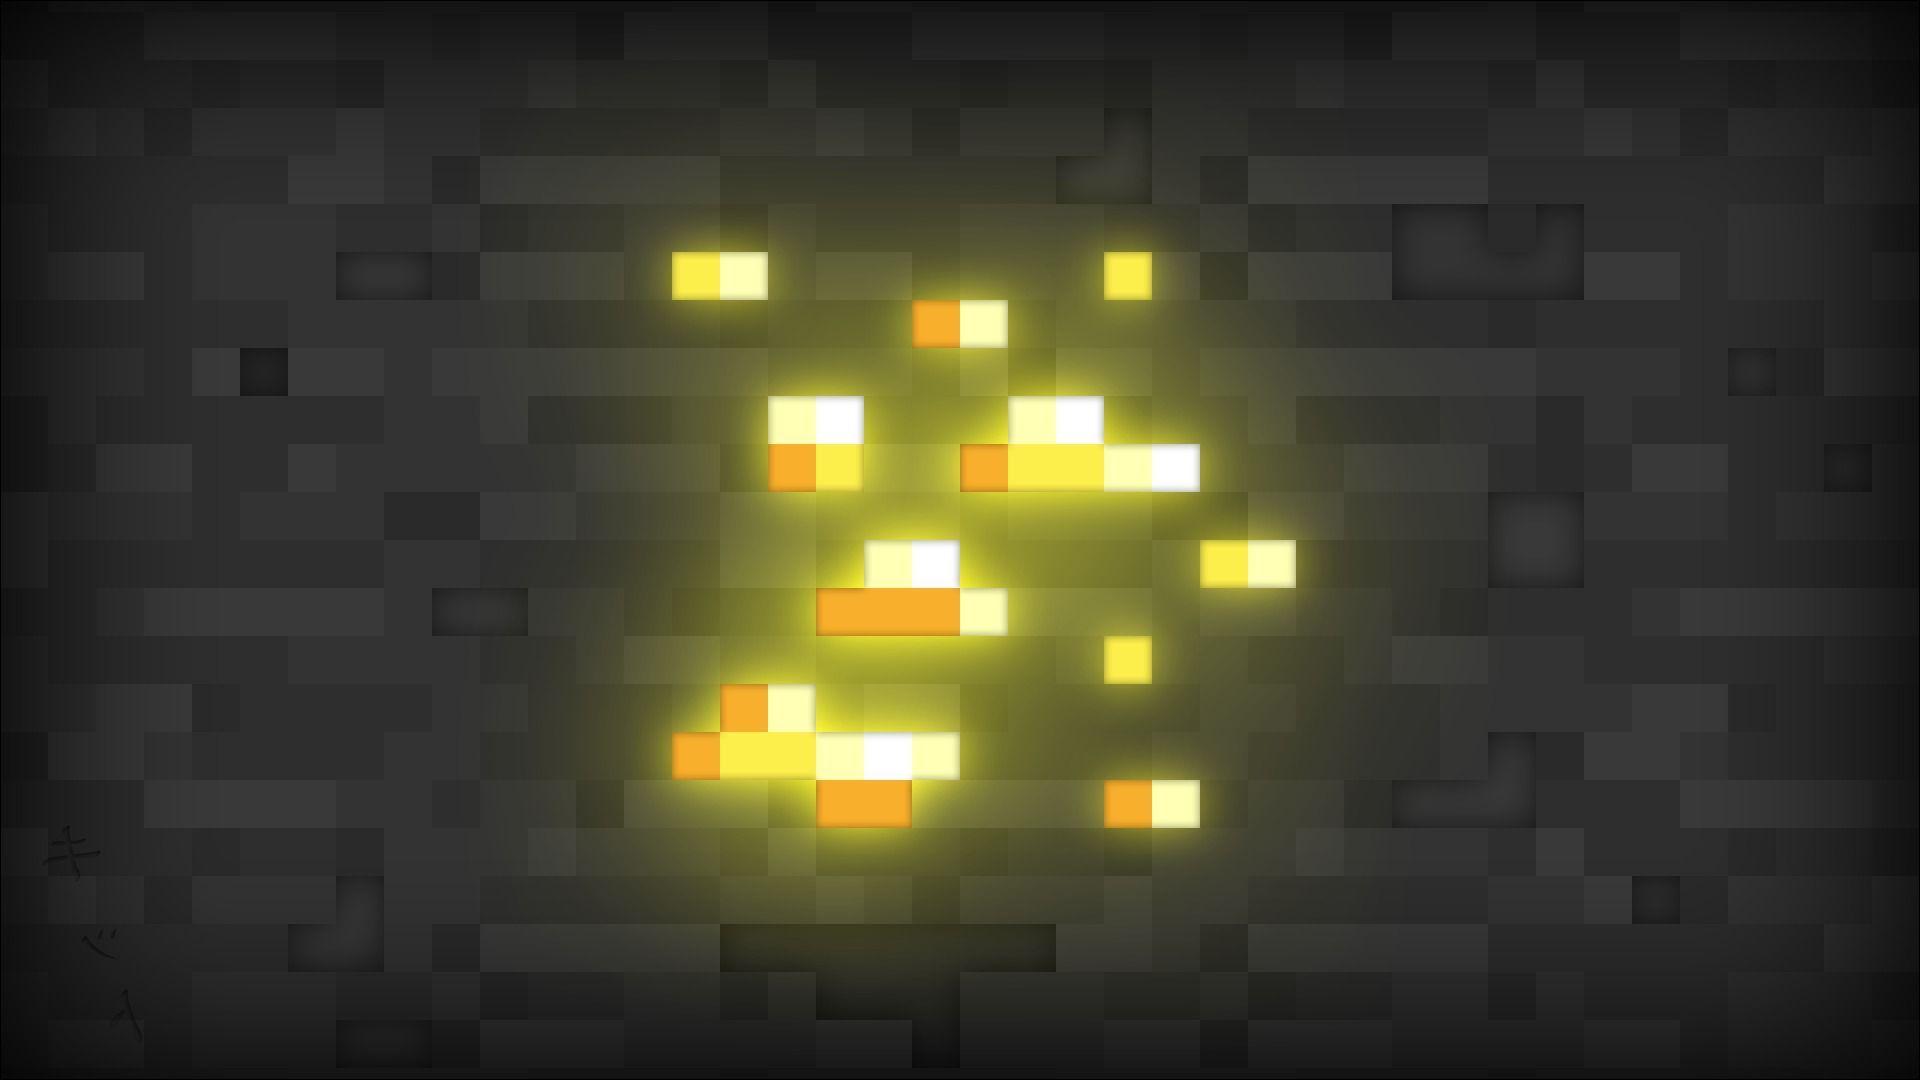 minecraft portal live wallpaper - photo #33